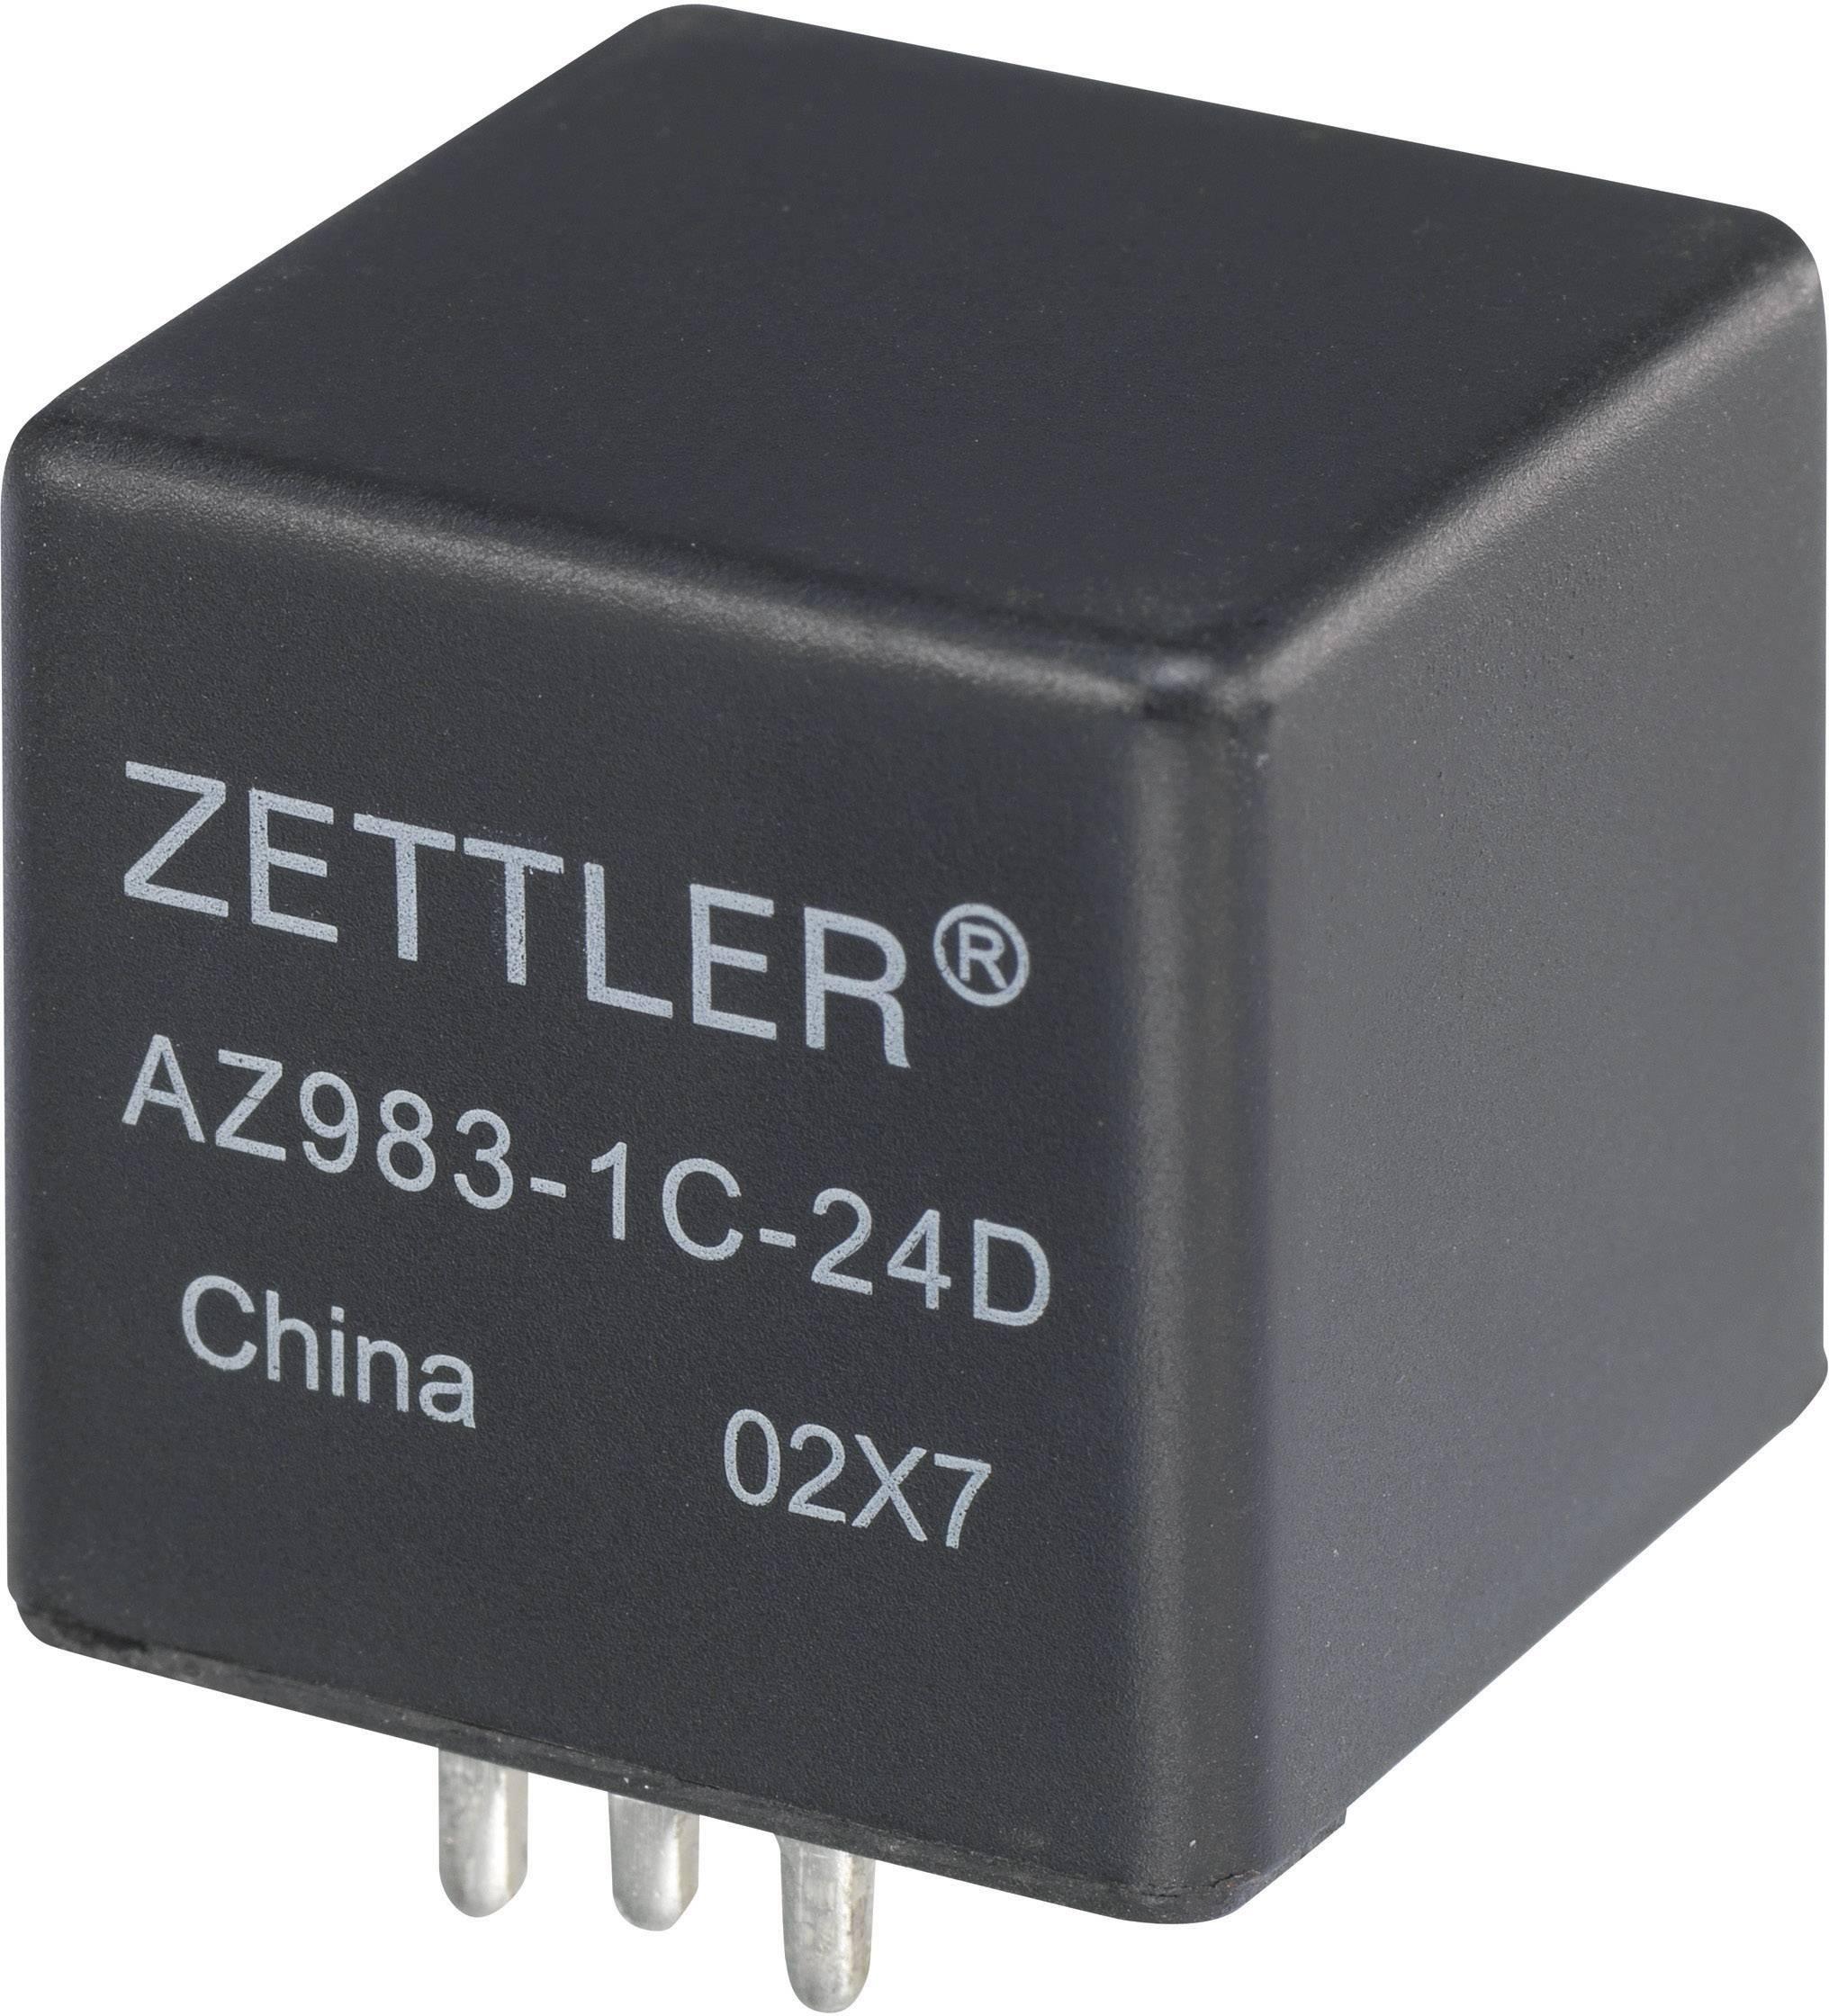 Miniaturní automobilové relé Zettler Electronics AZ983-1C-24D